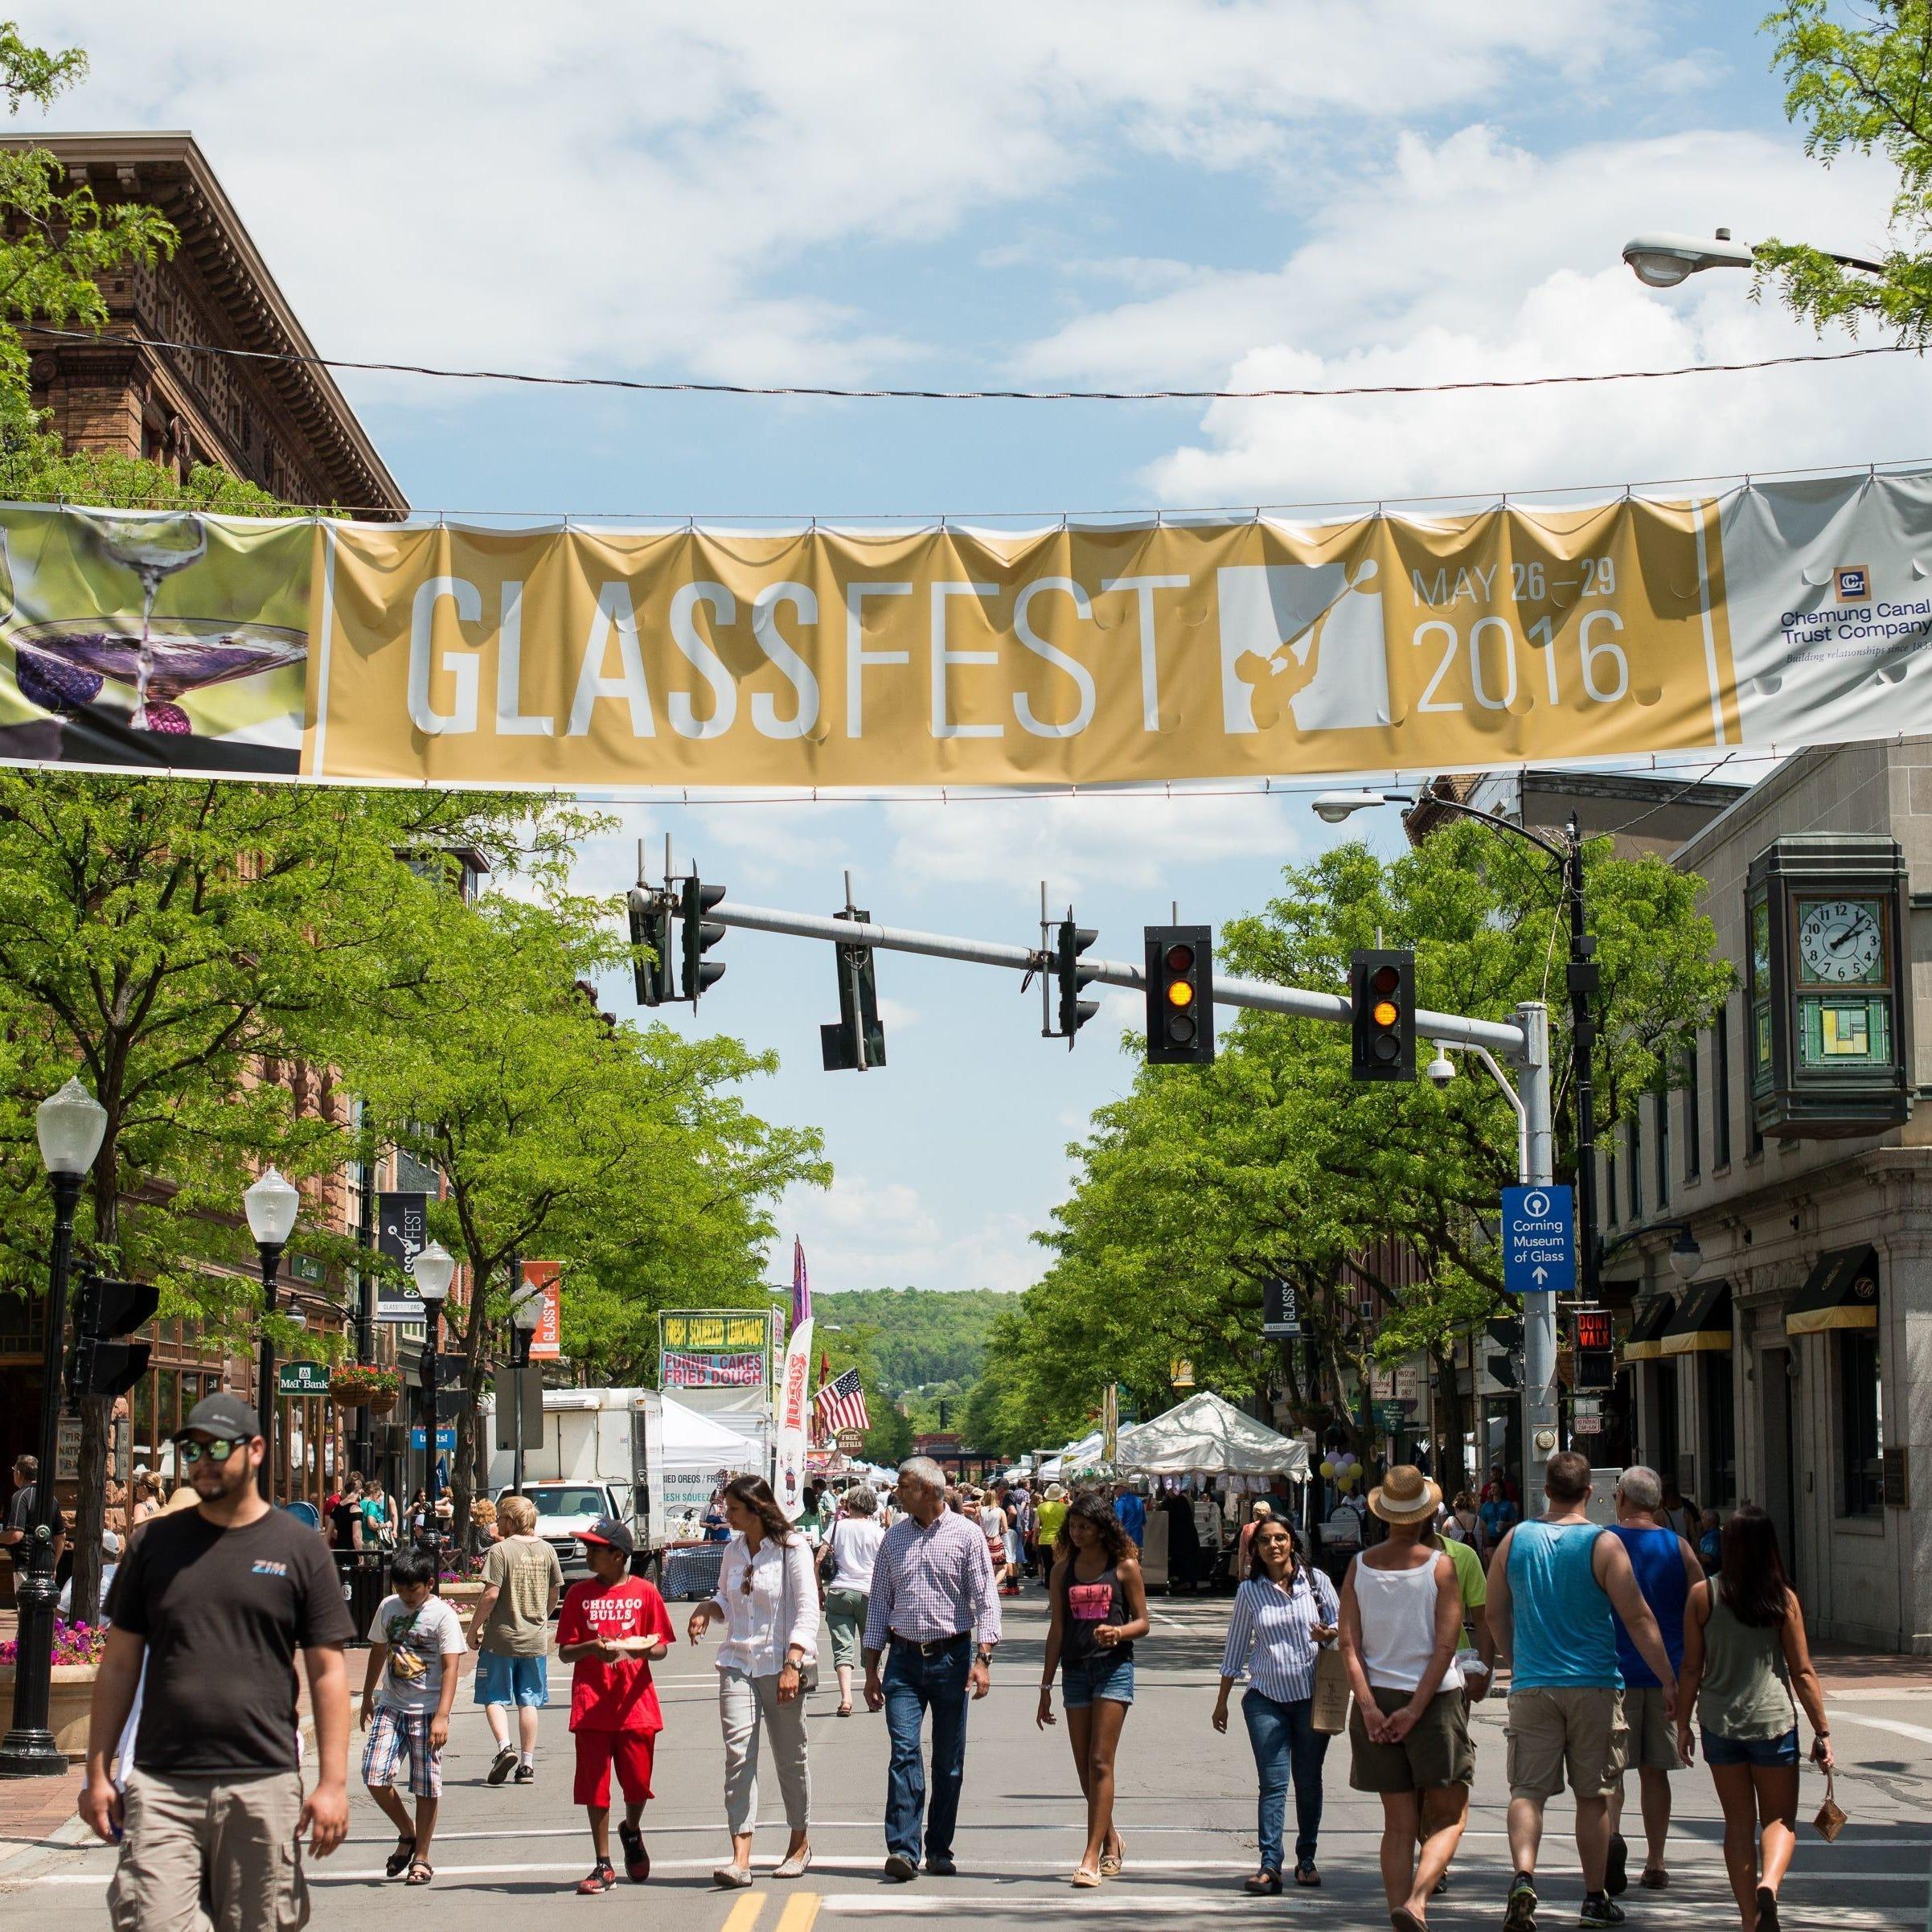 Corning, Wellsboro in quarterfinals of America's Main Street contest